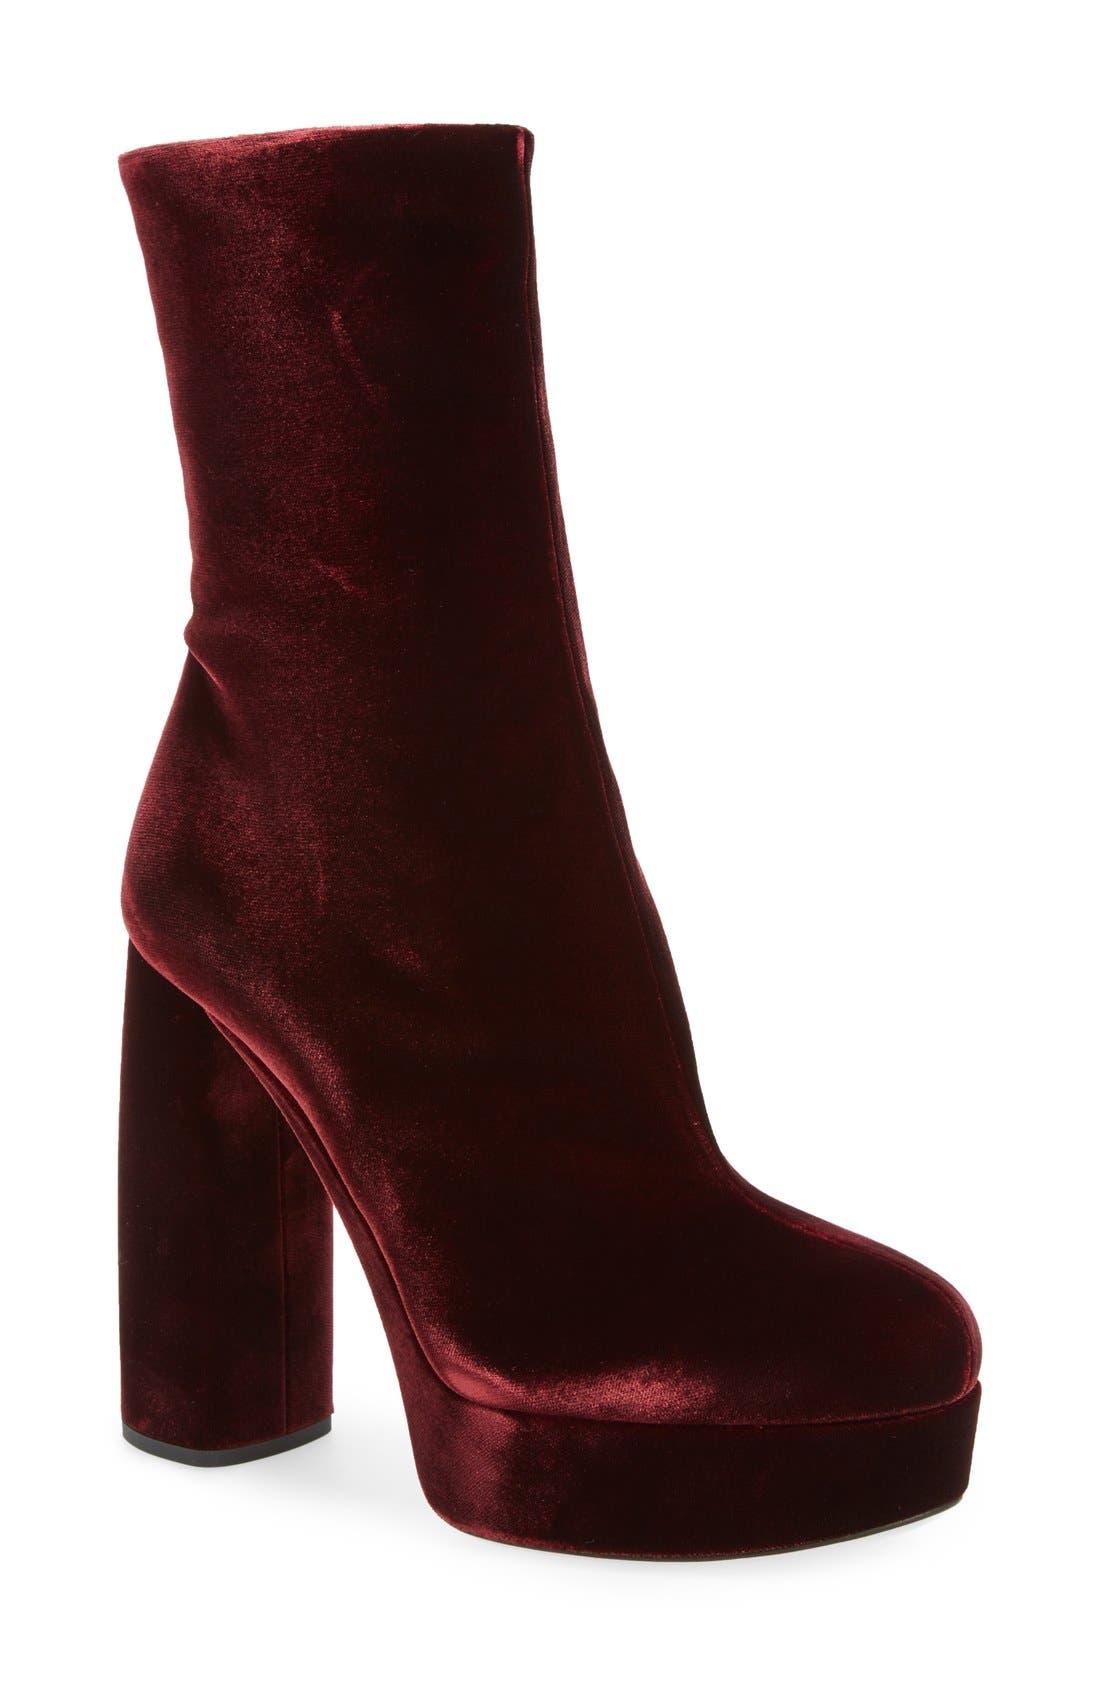 Main Image - Miu Miu Platform Block Heel Boot (Women)